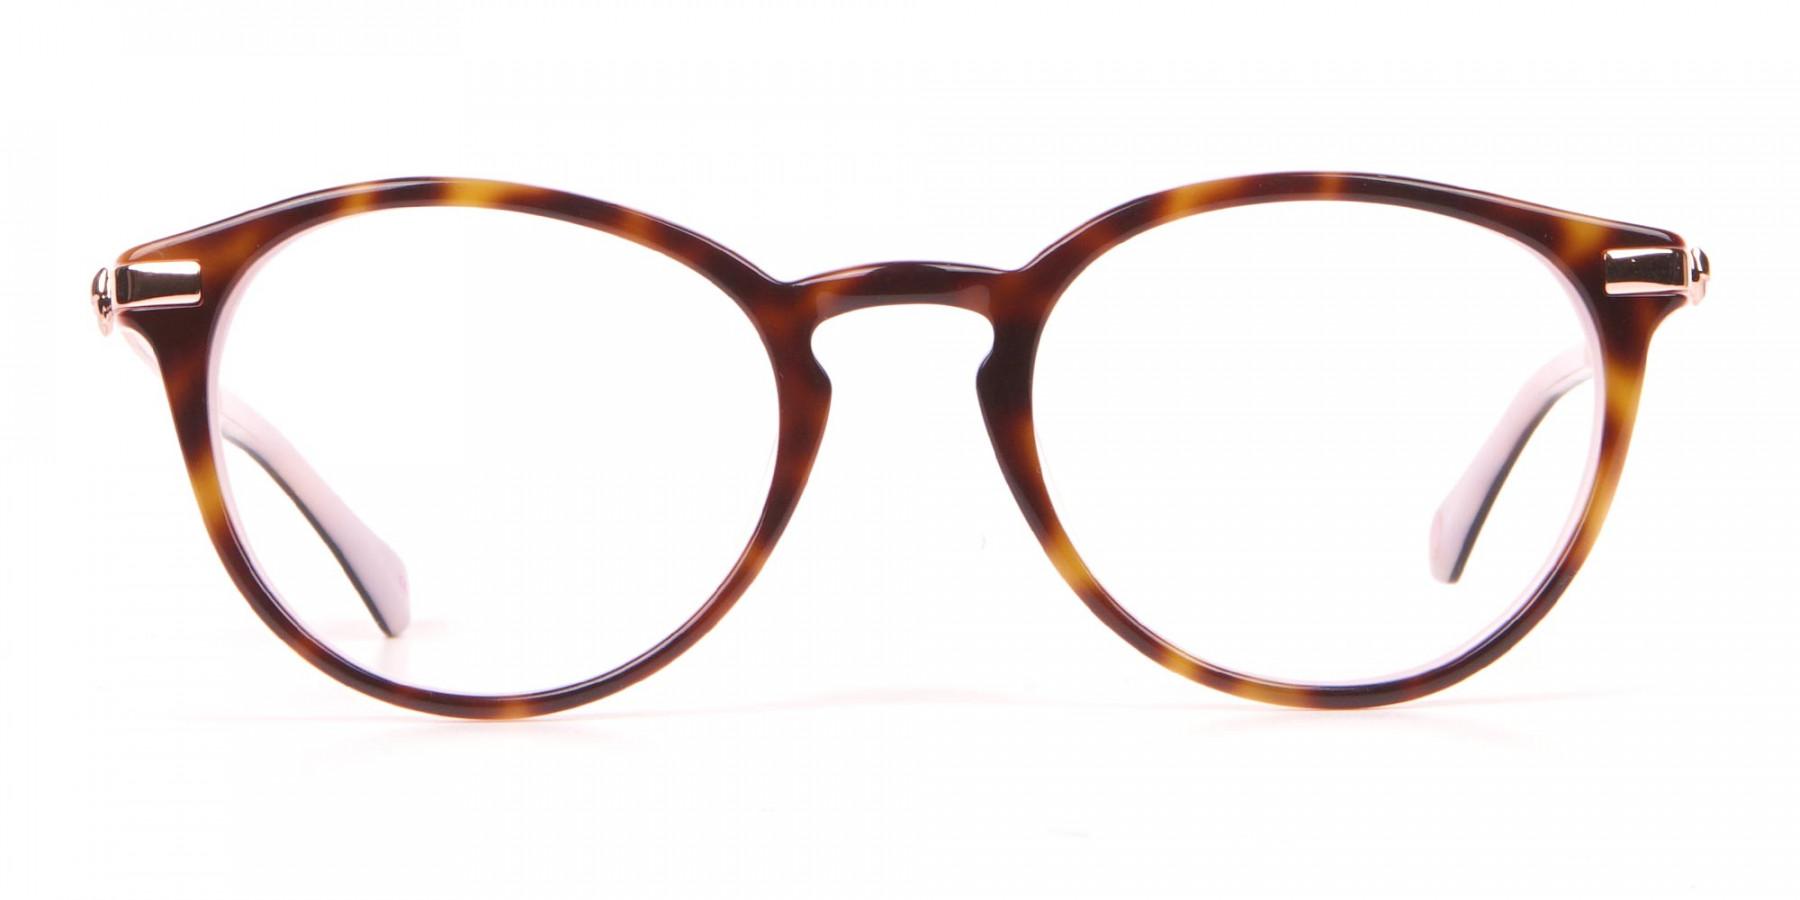 Ted Baker TB9132 Val Women Pink & Tortoise Round Glasses-1